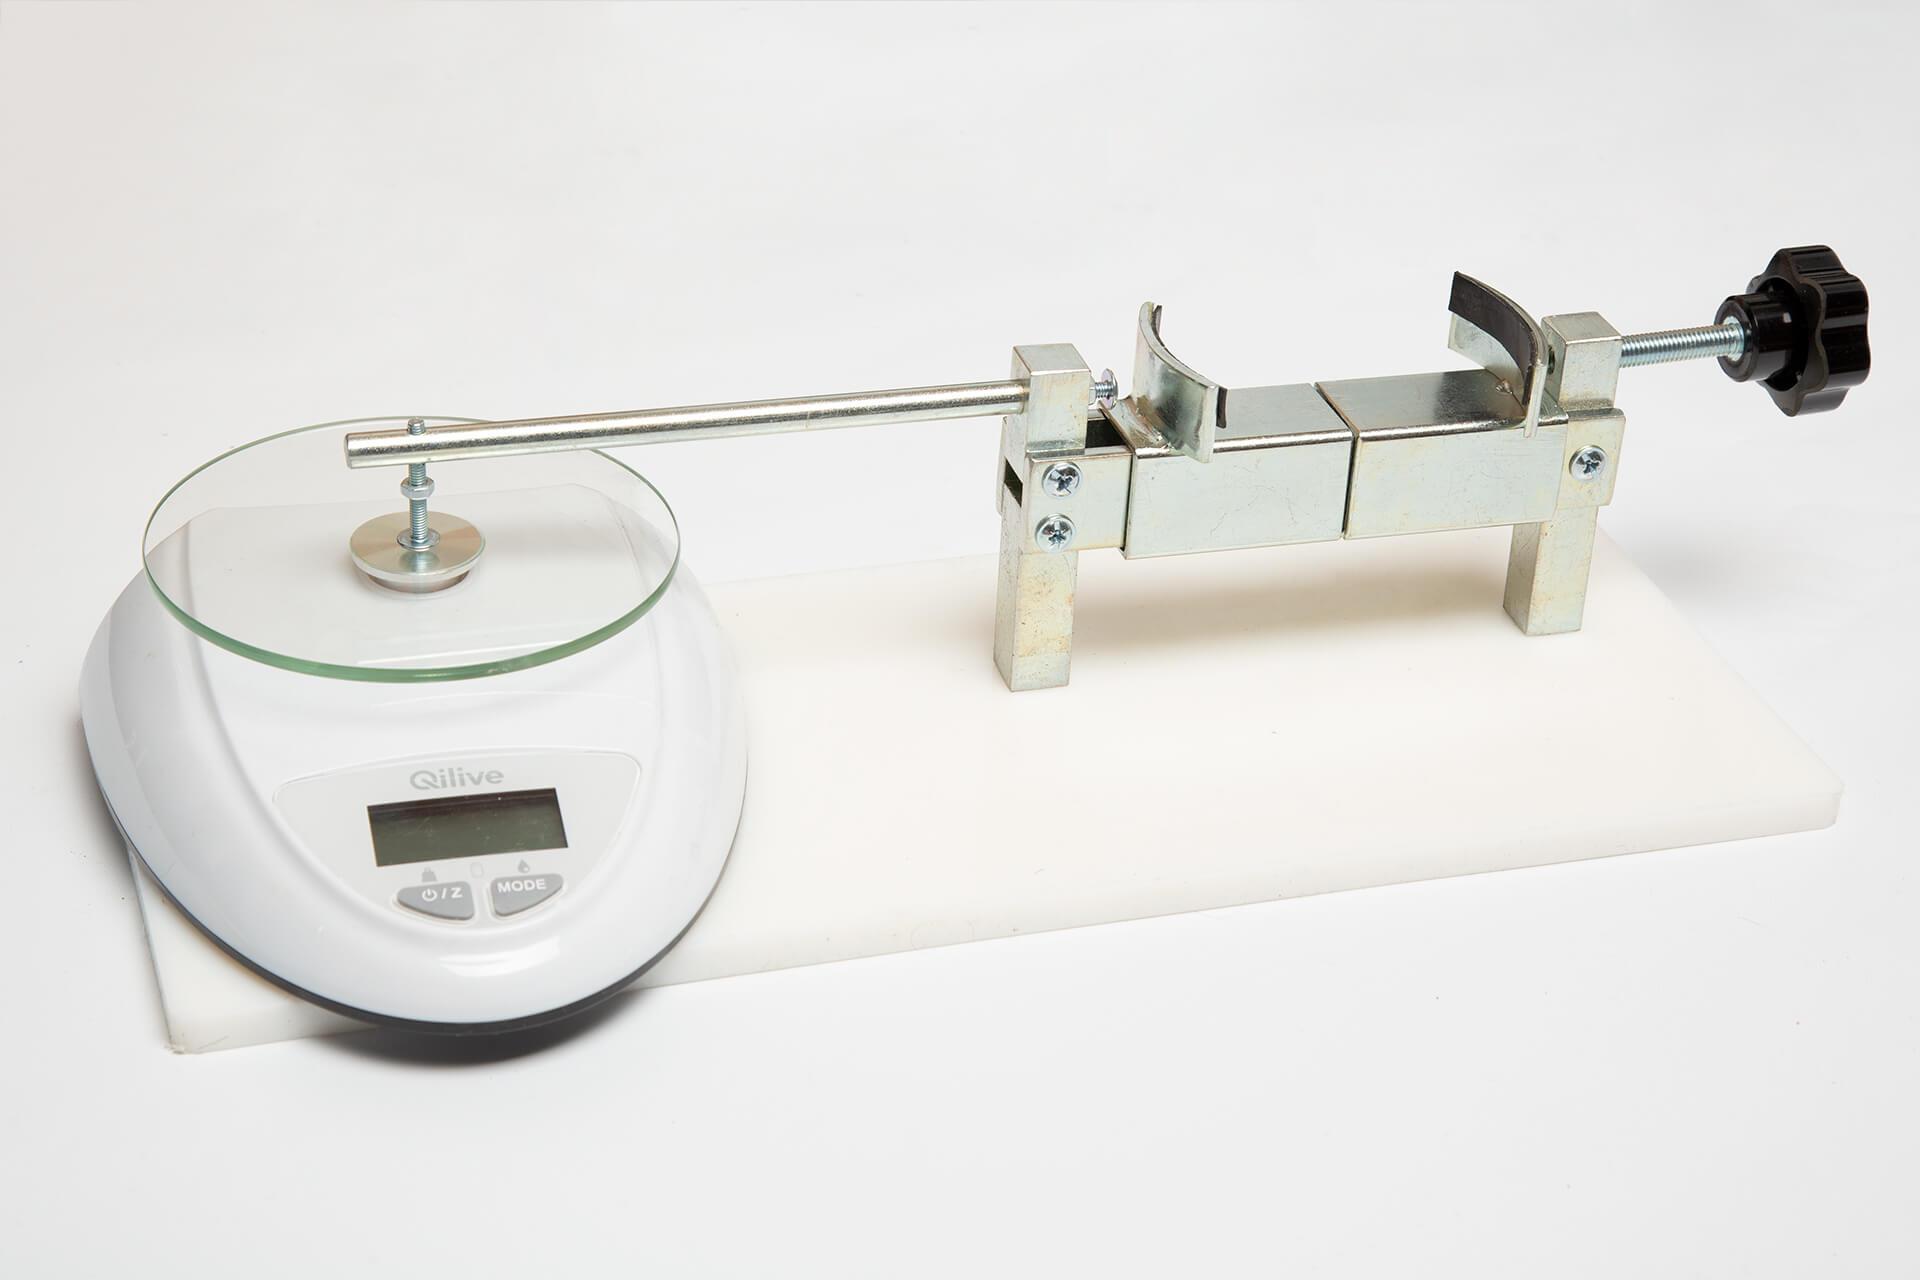 Kit WHEE - dynamometer   www.wheetarget.com  Landing WHEE WPBakery – ENG kit whee dinamometro